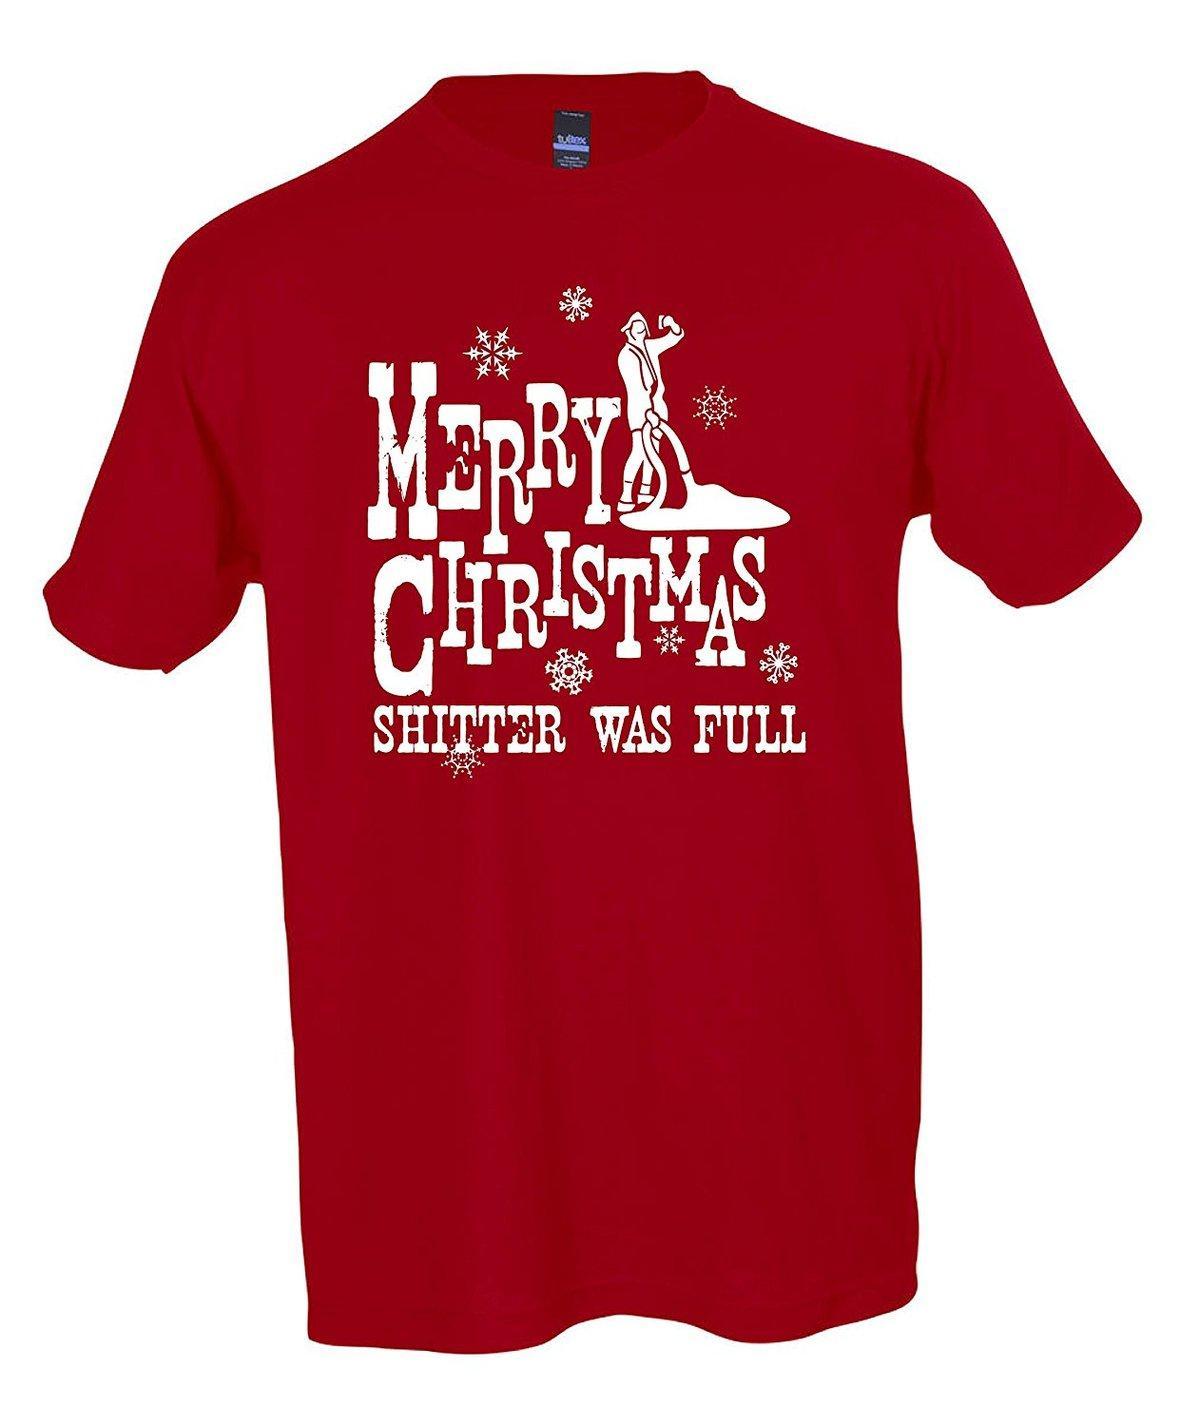 merry christmas shitter was full t shirt national lampoons christmas vacation cartoon print short sleeve t shirt 10 t shirts cool shirts designs from